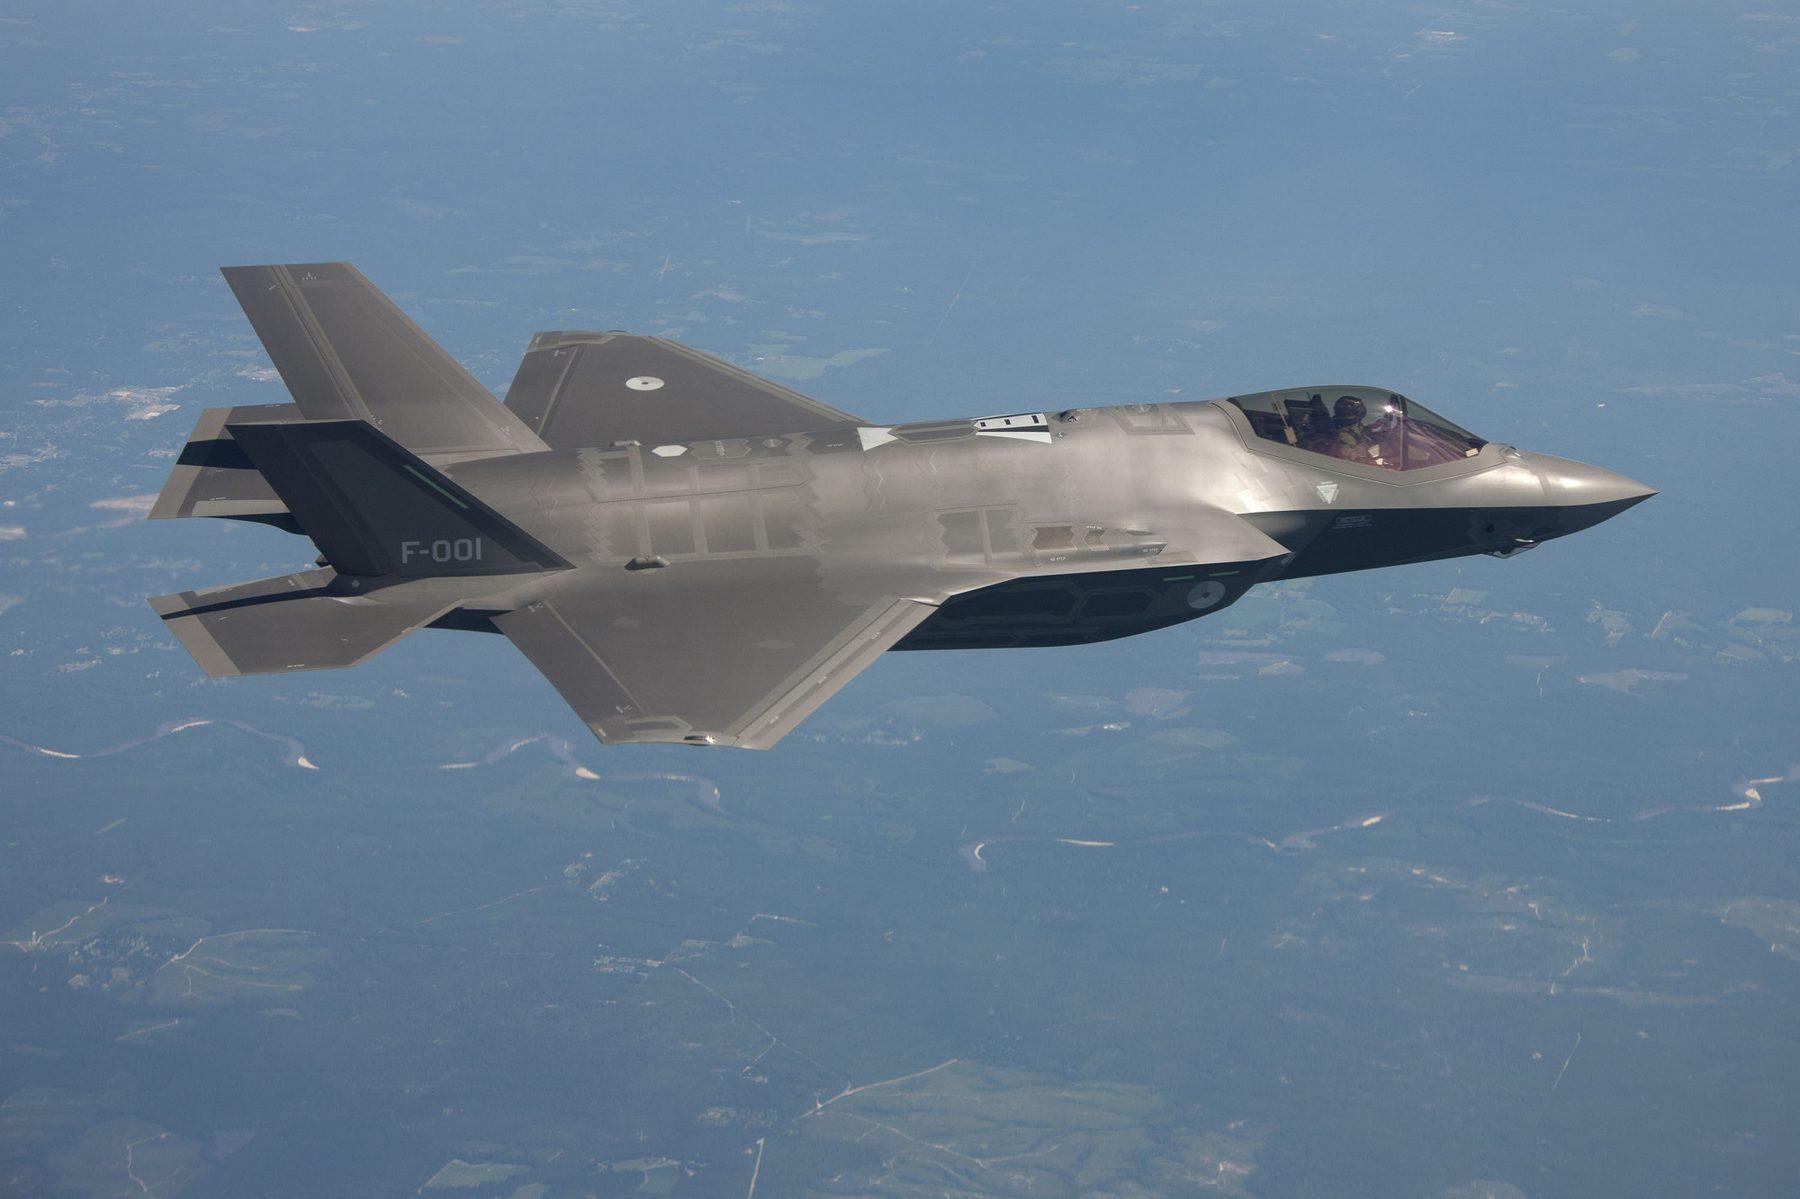 Royal Air Force - RAF (Sector Header: Fighter Plane)